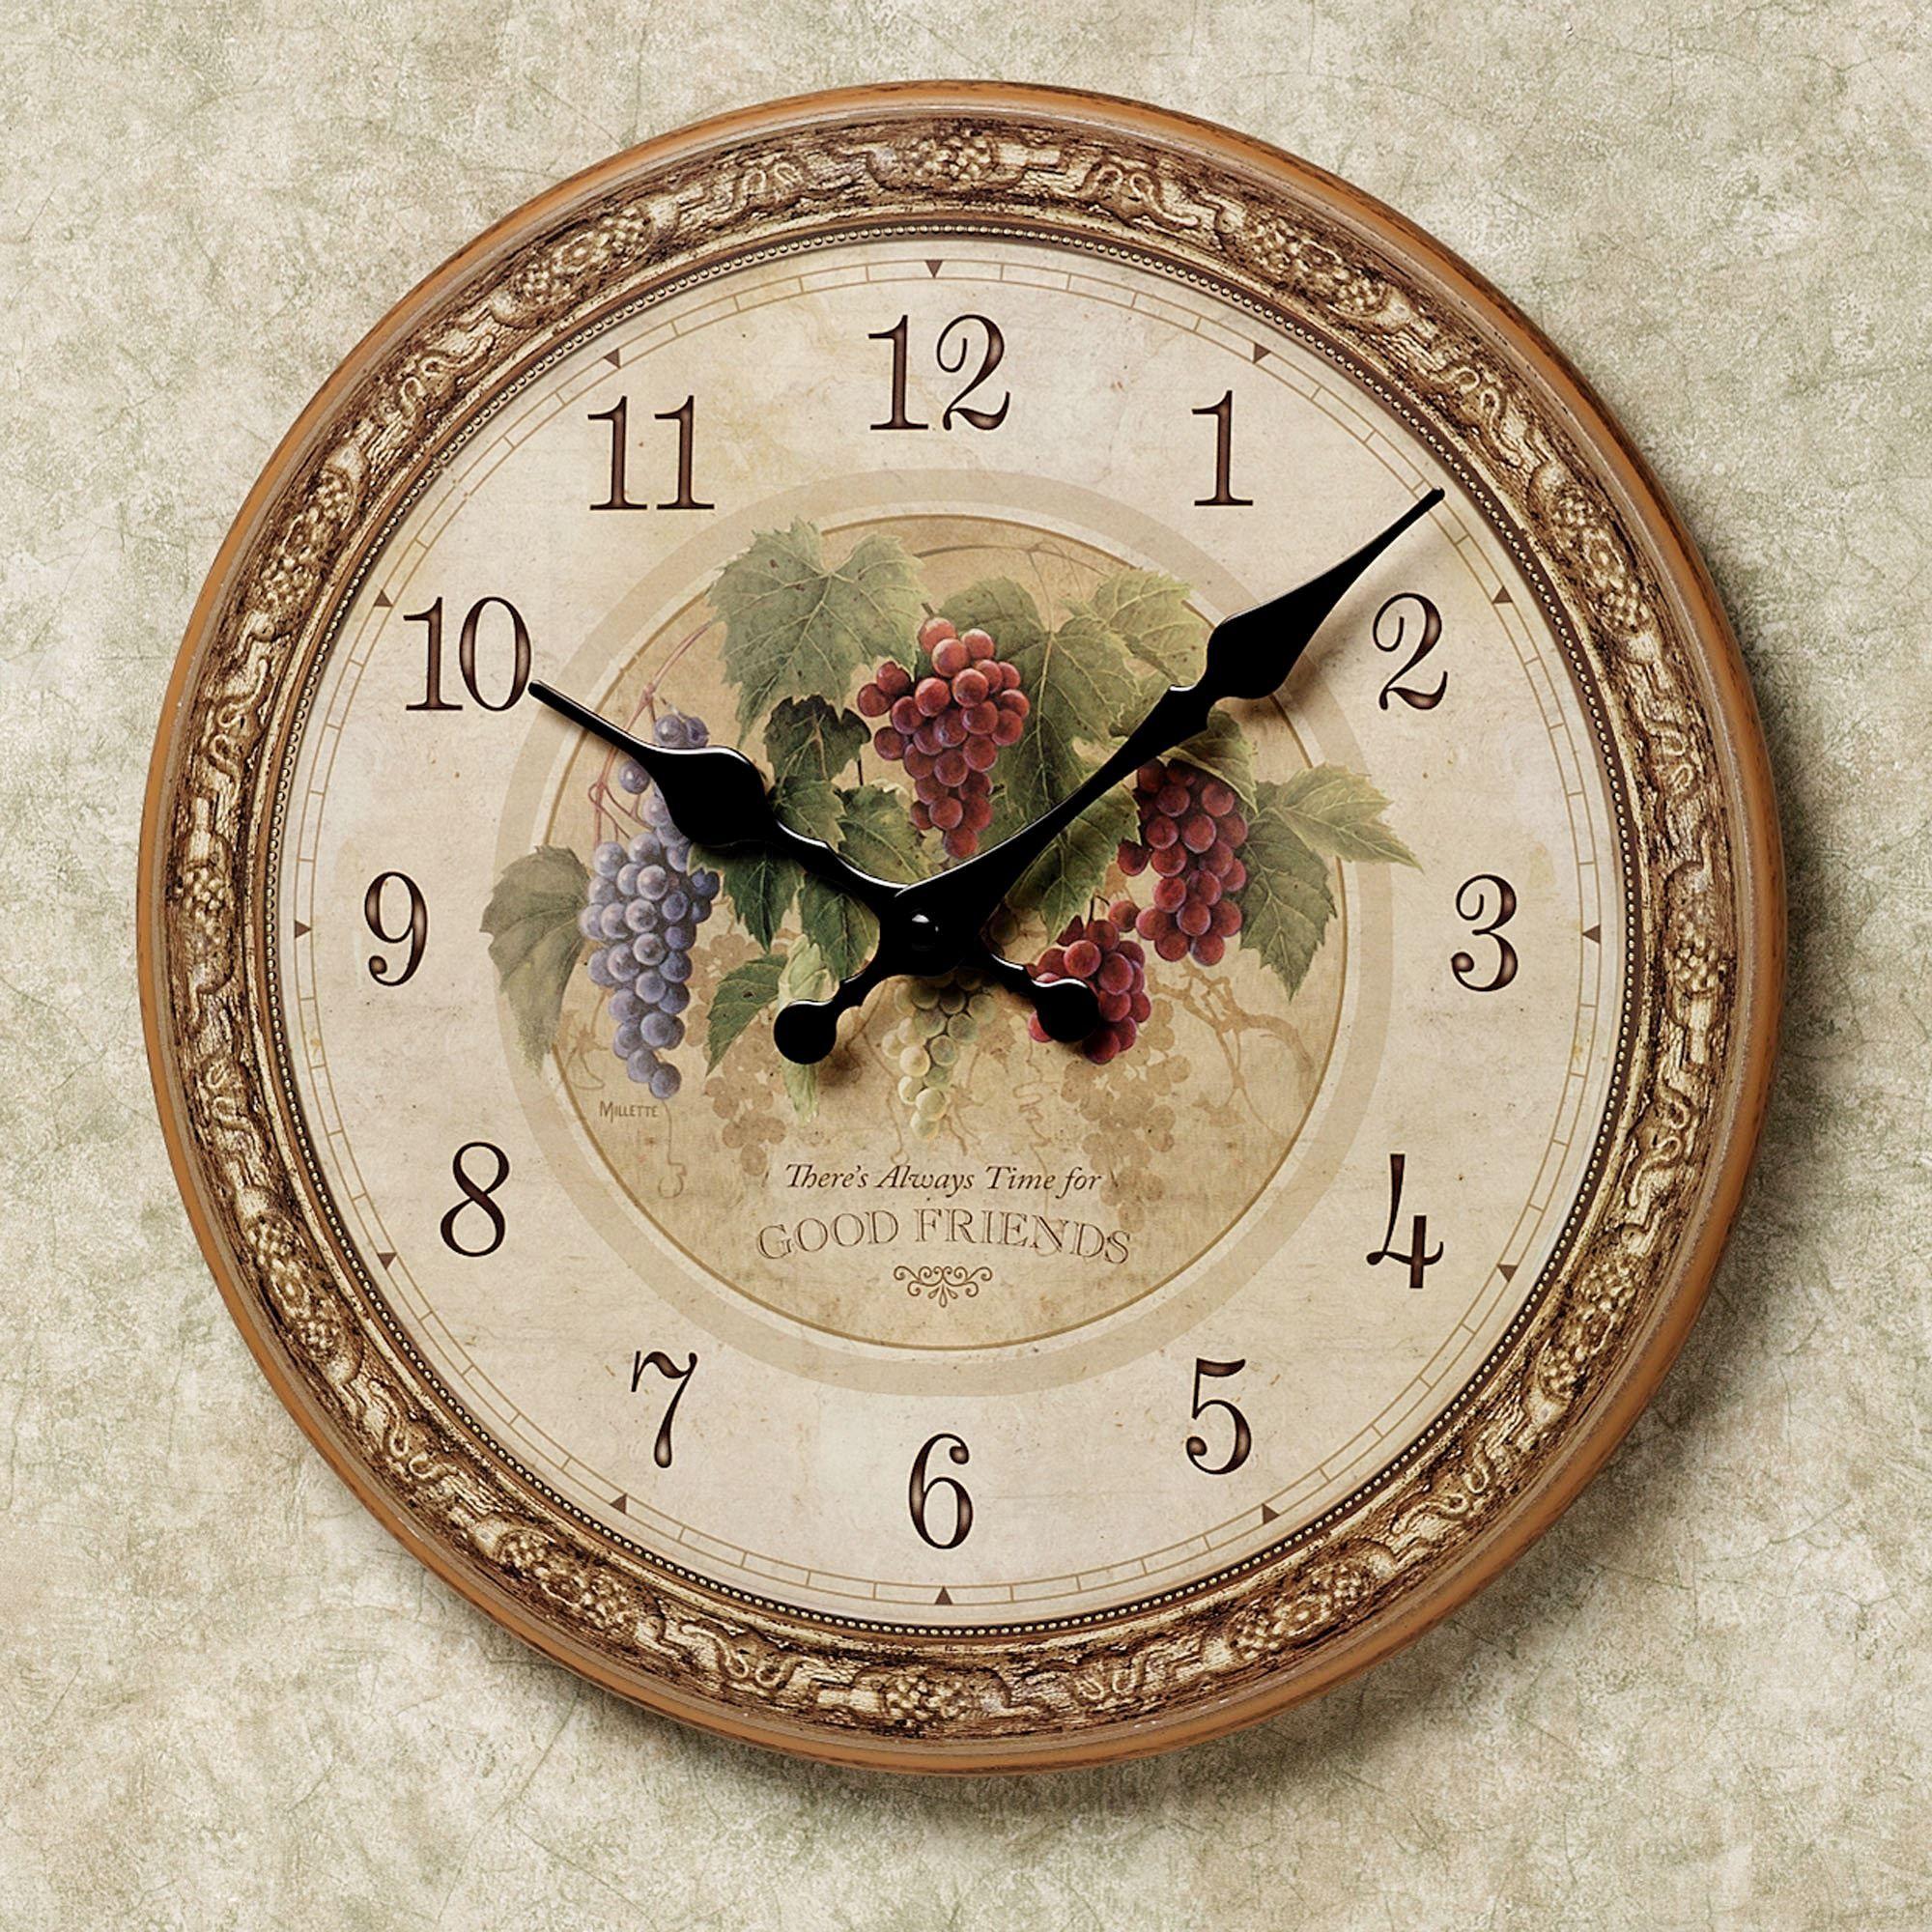 Winery Grapes Round Wall Clock